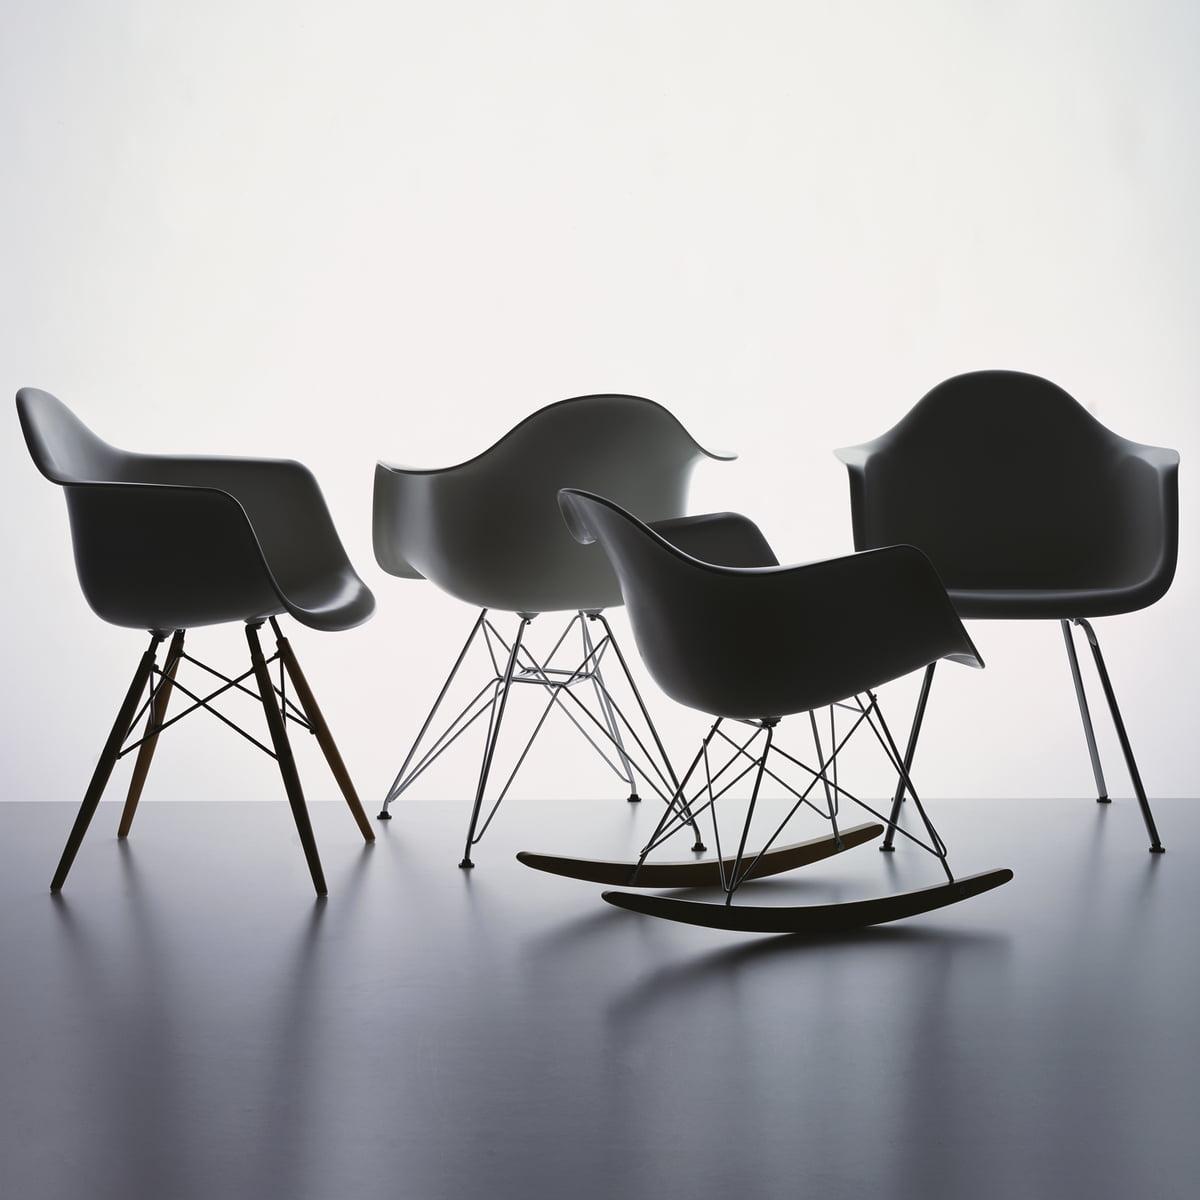 Vitra   Eames Plastic Armchair, Basalt   Group